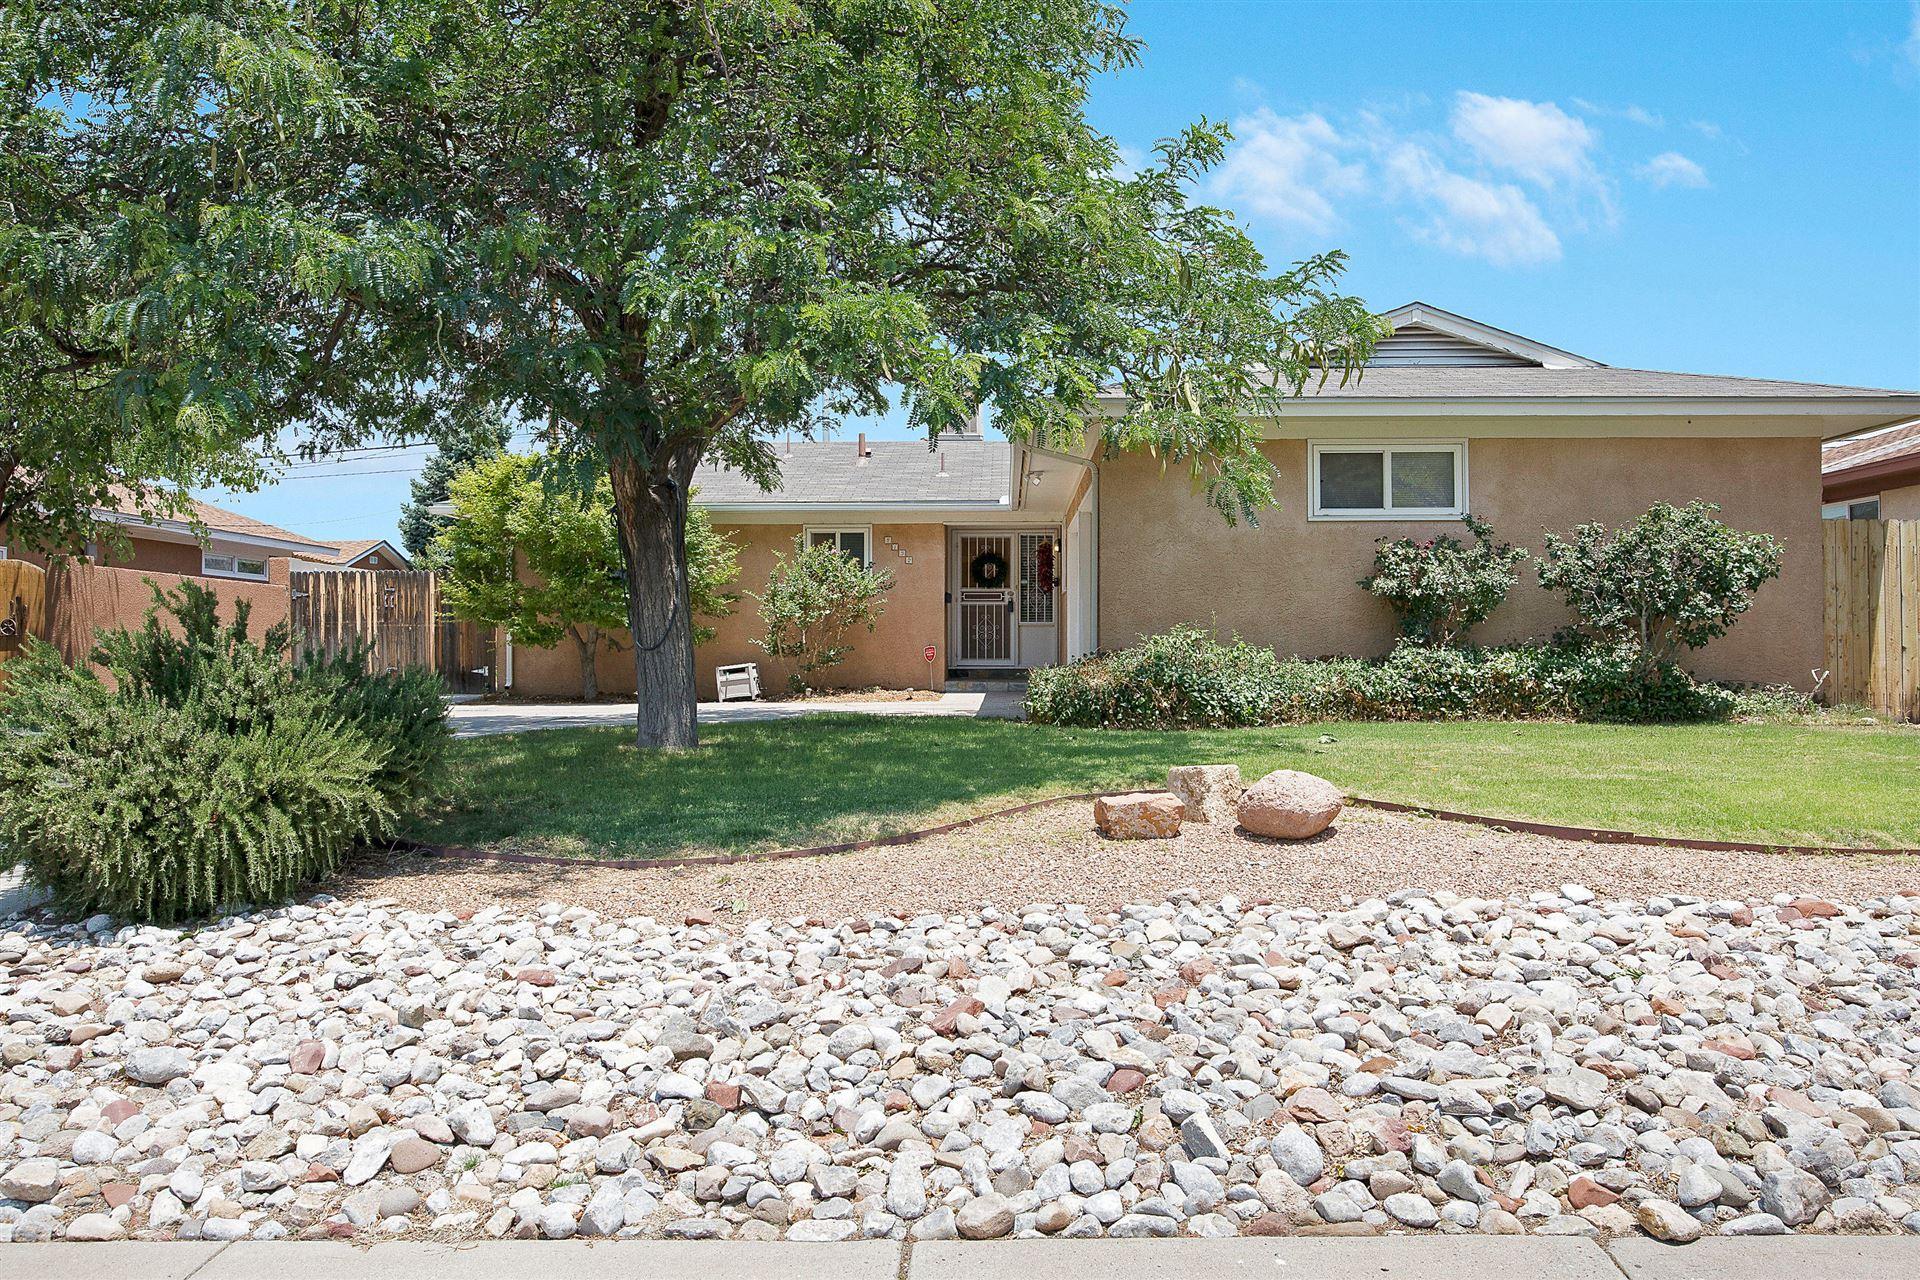 Photo of 2132 GLORIETA Street NE, Albuquerque, NM 87112 (MLS # 994485)